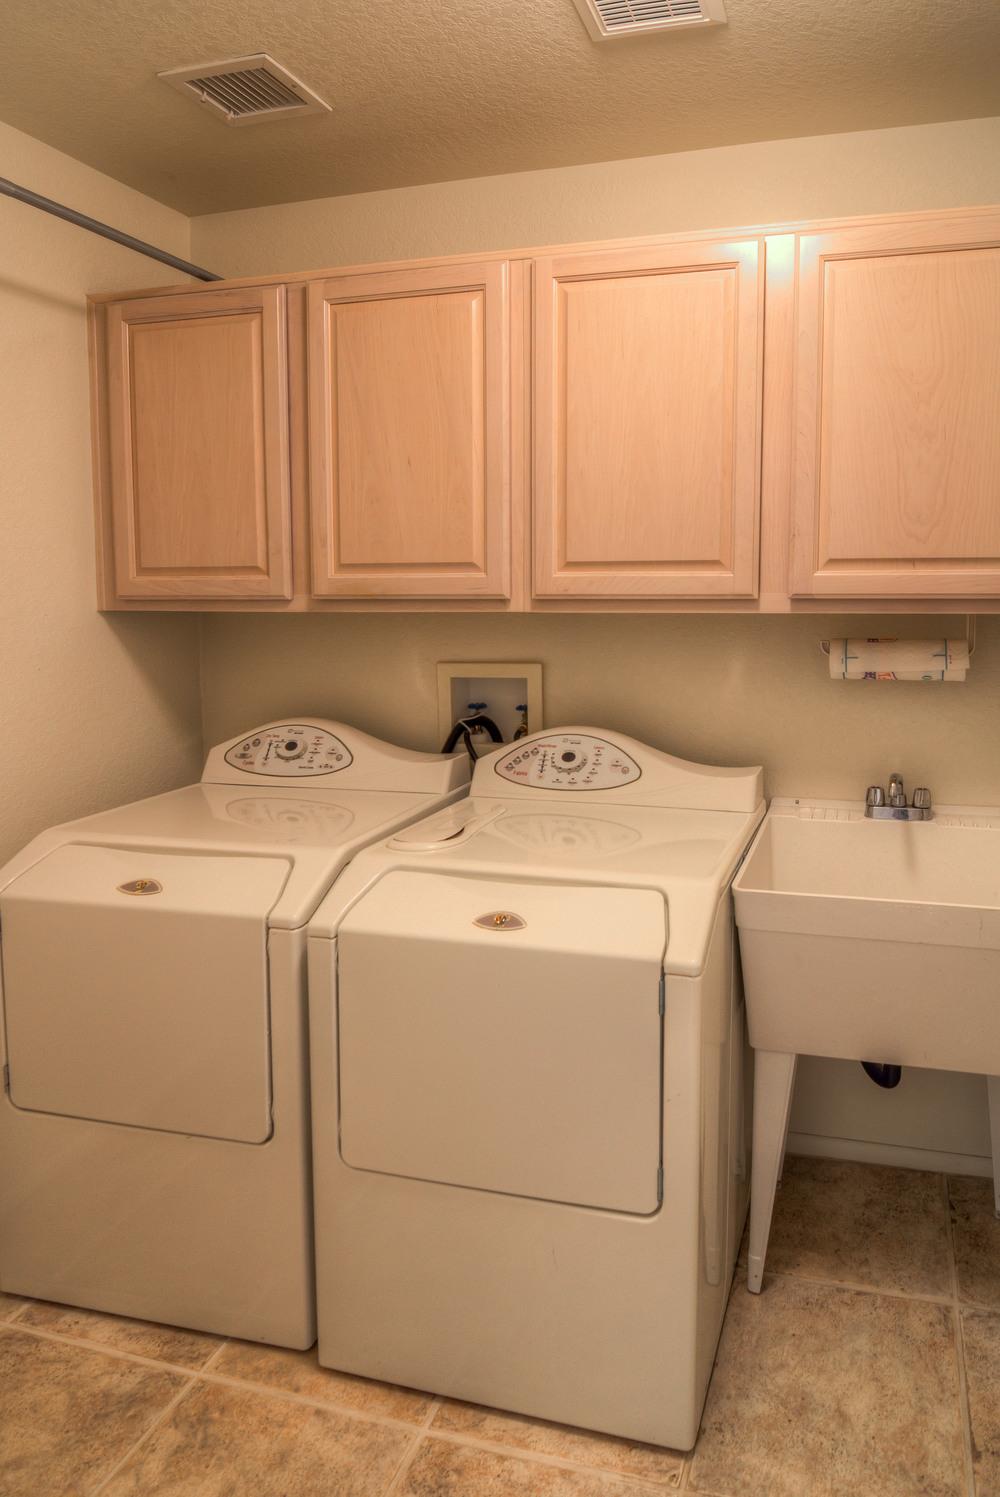 39 Laundry Room.jpg